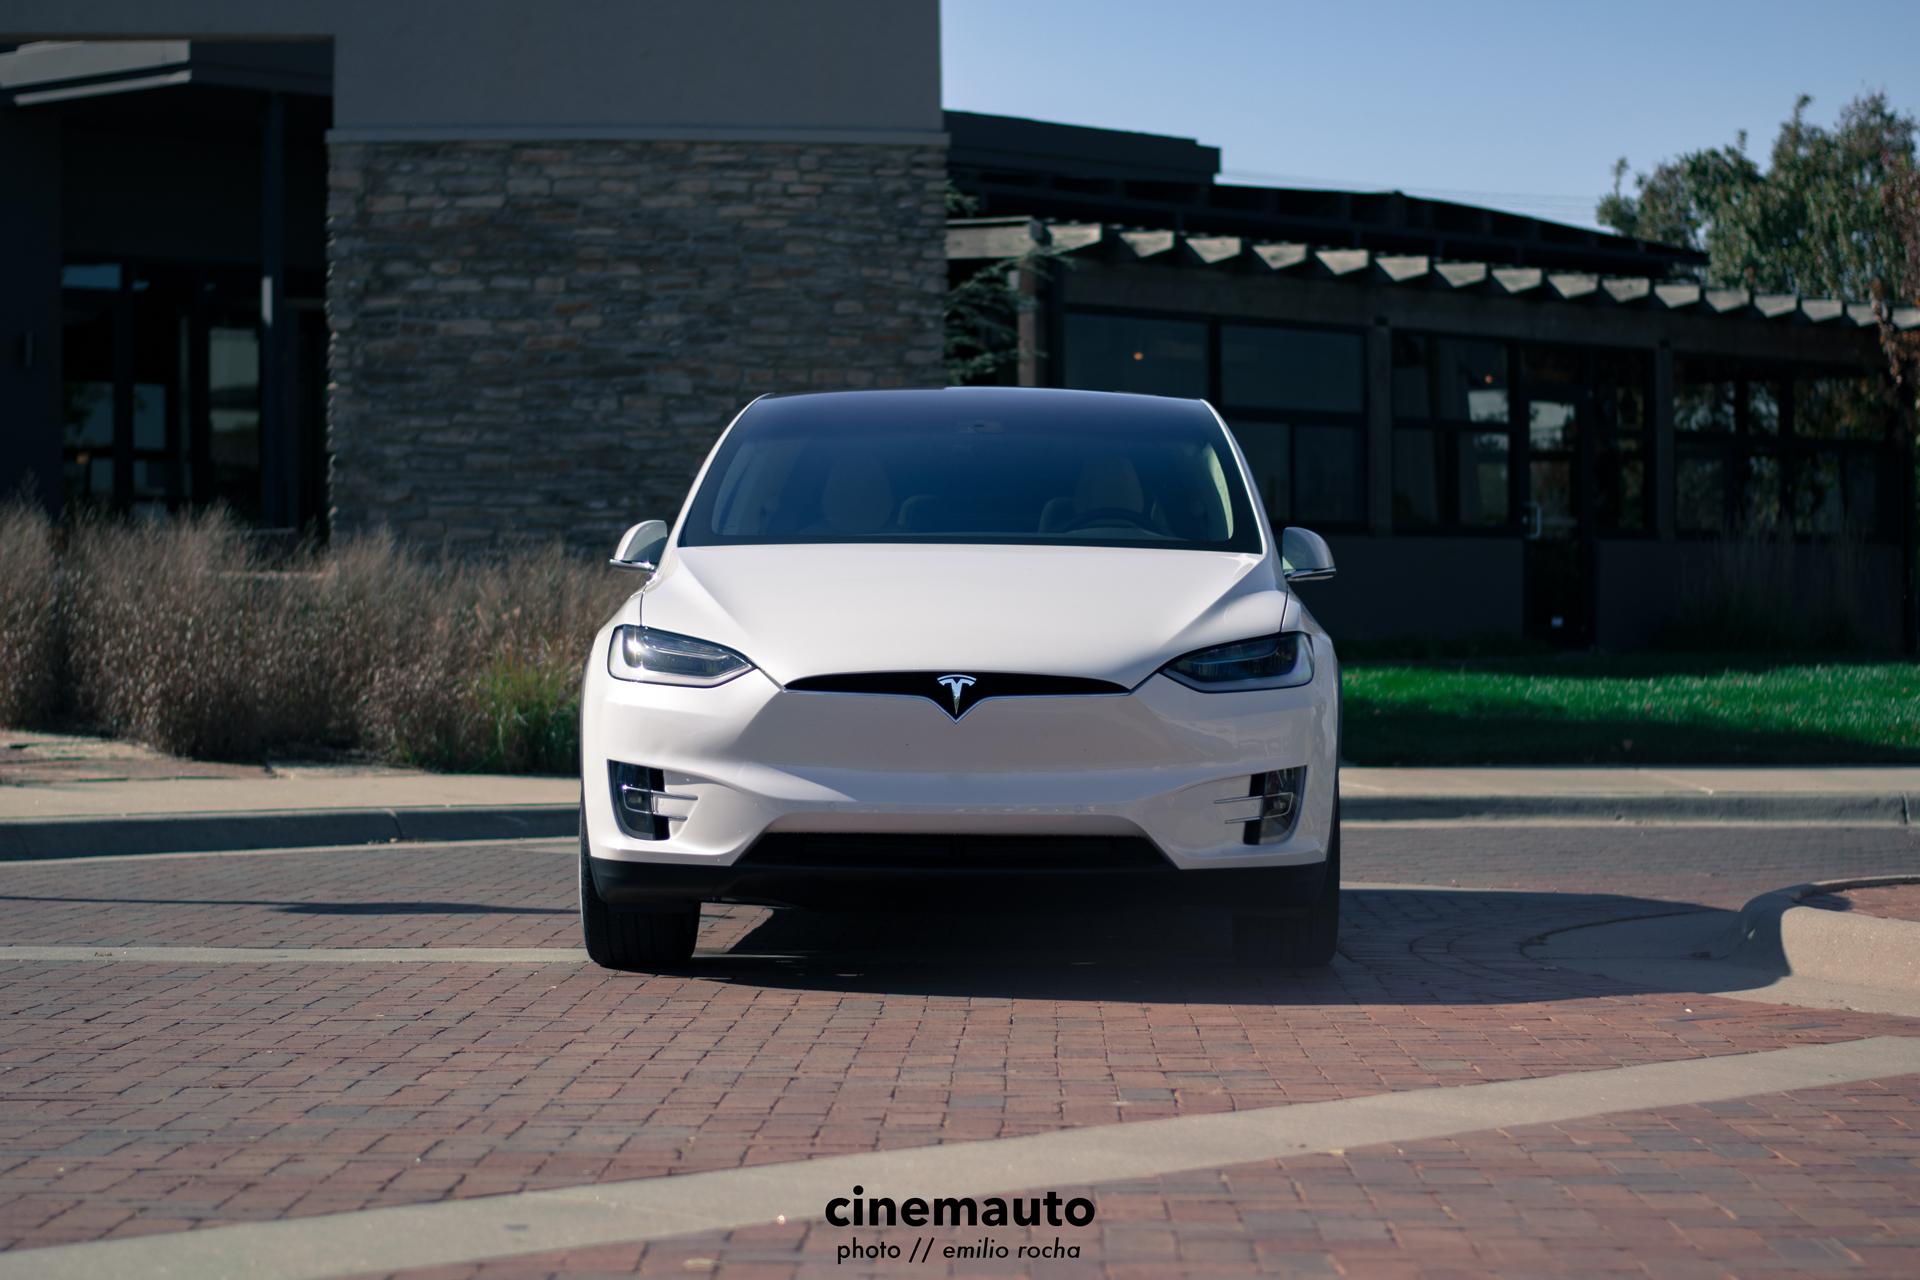 TeslaCinemauto-3.jpg